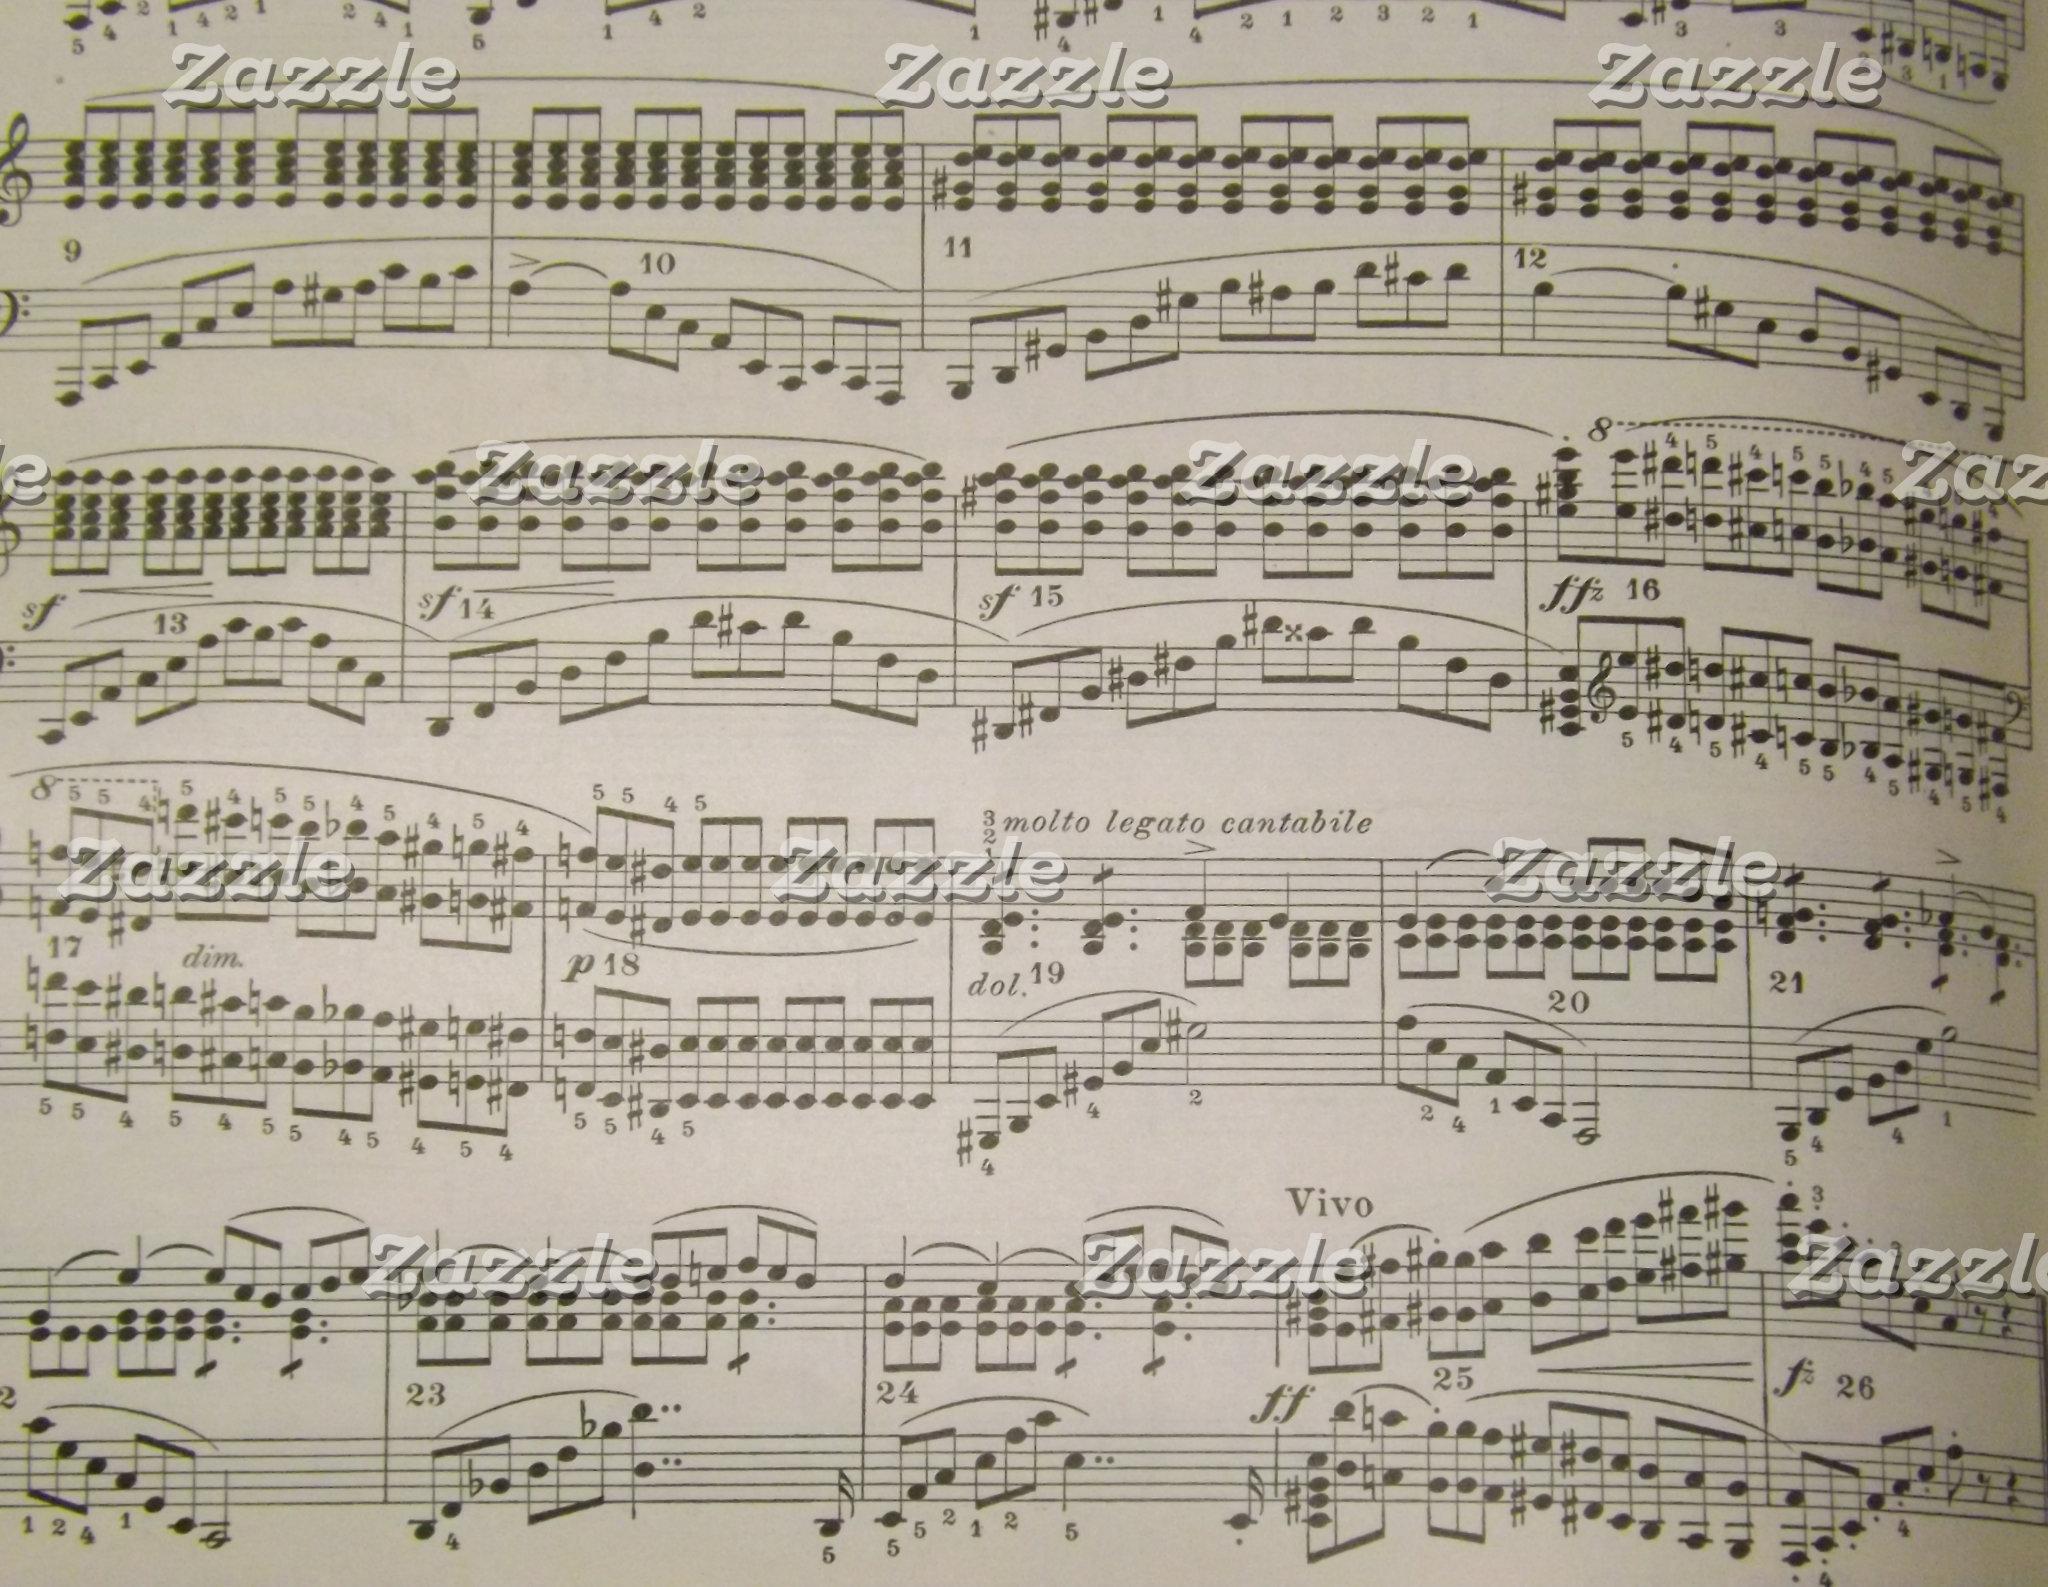 Chords and Arpeggios